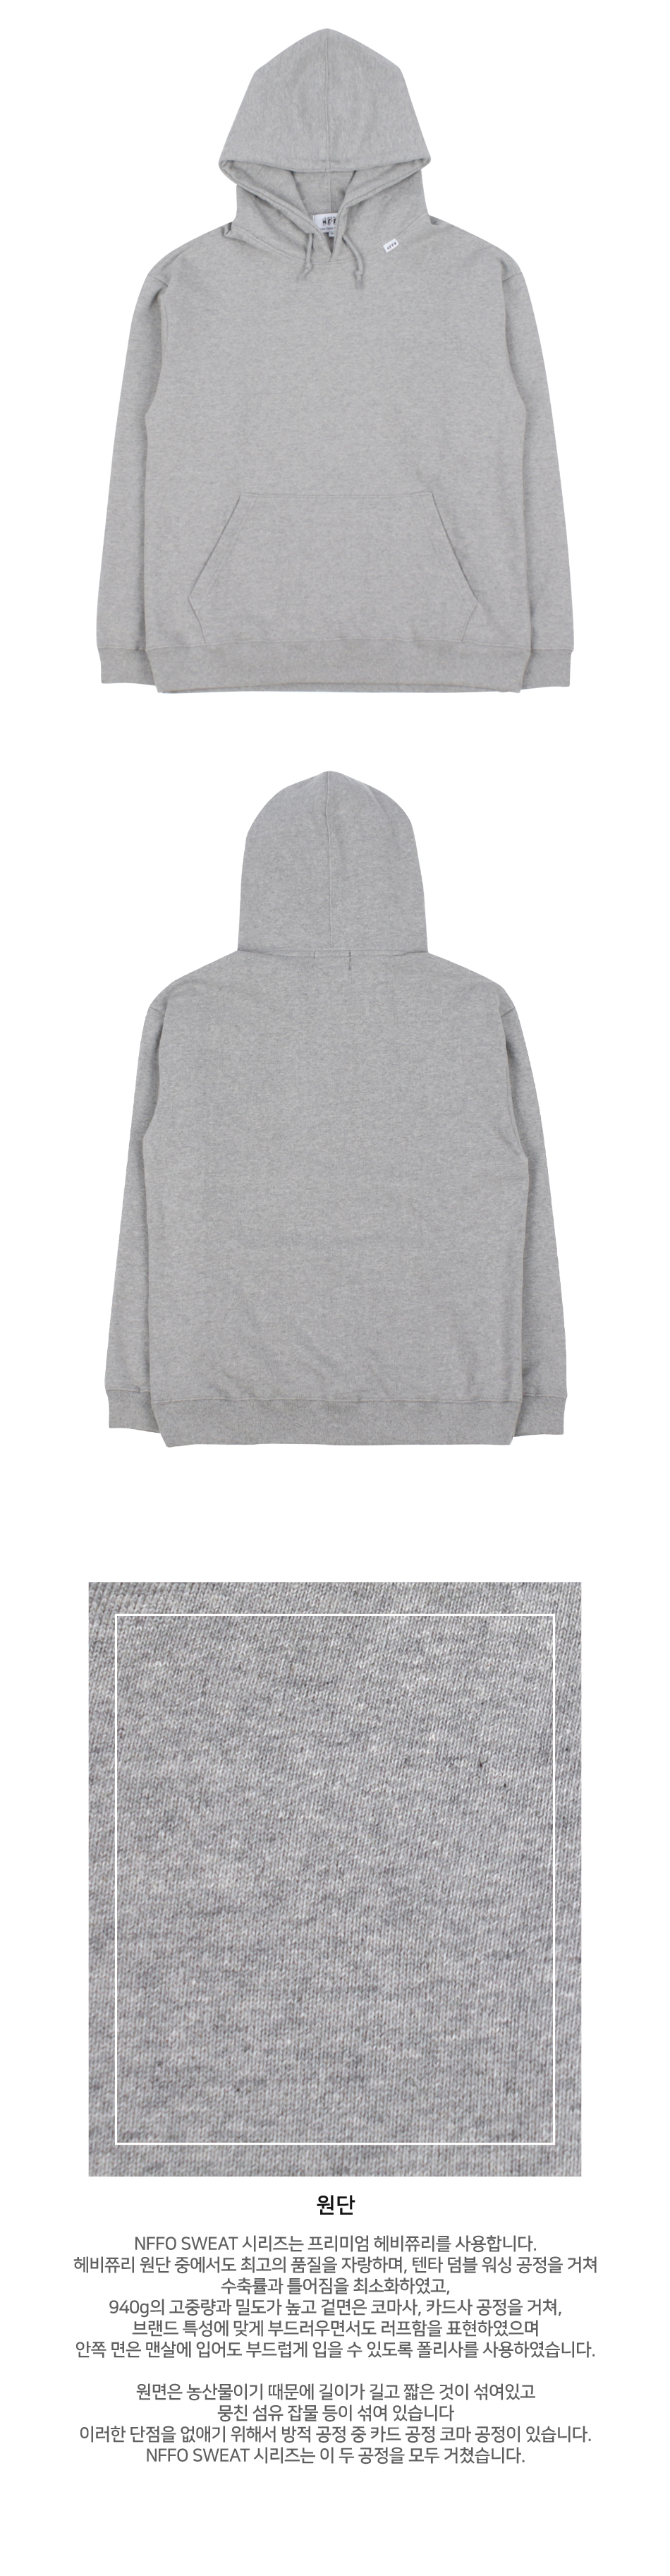 18 NFFO 2020FW Basic Sweat hoody gray 2.jpg